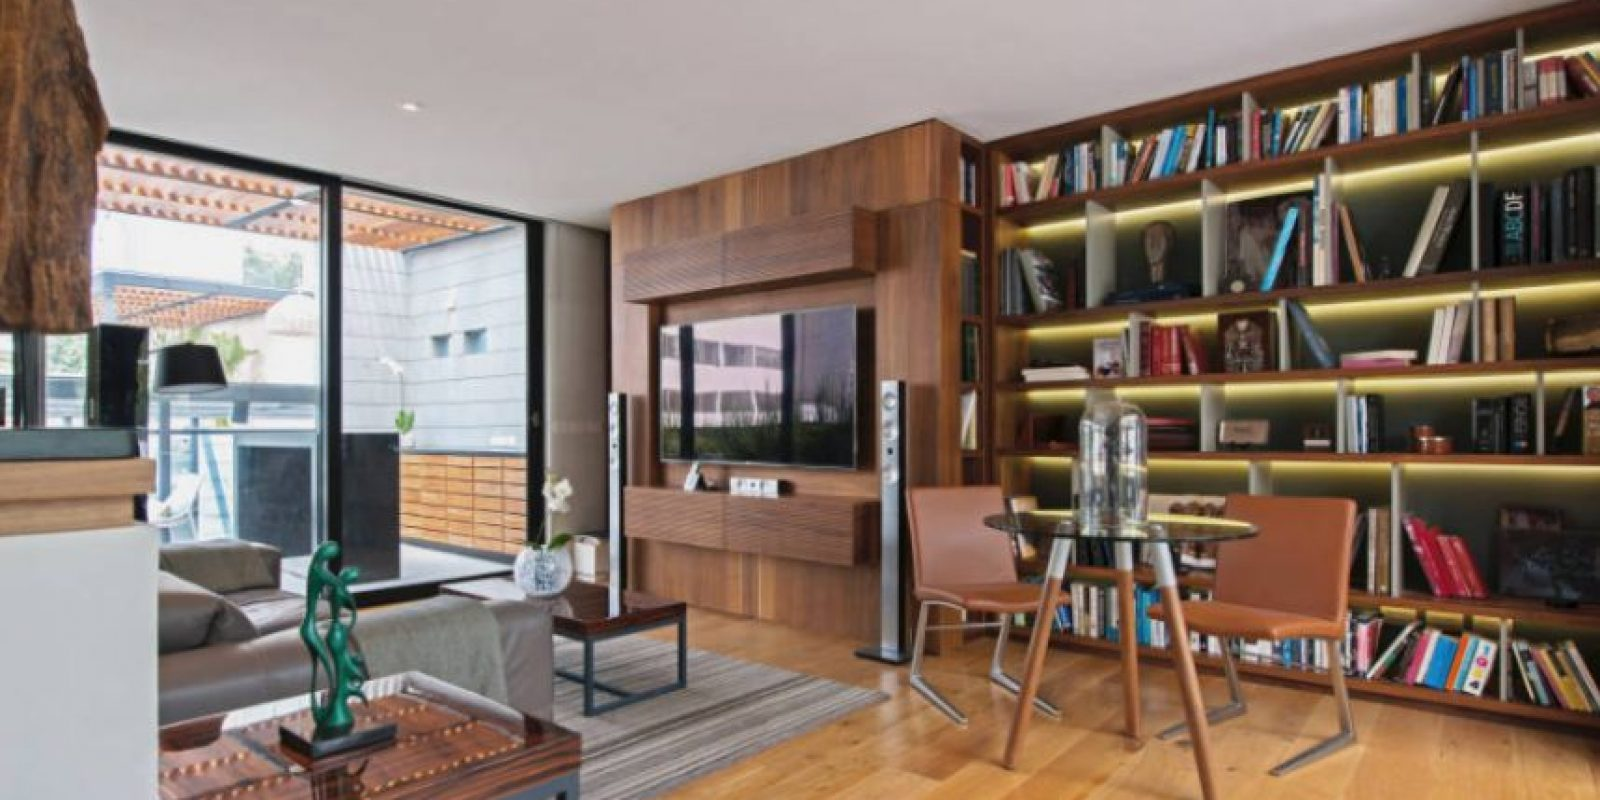 Diseño por Faci Leboreiro Arquitectura Foto:https://www.homify.com.mx/fotografia/520093/ph-andersen